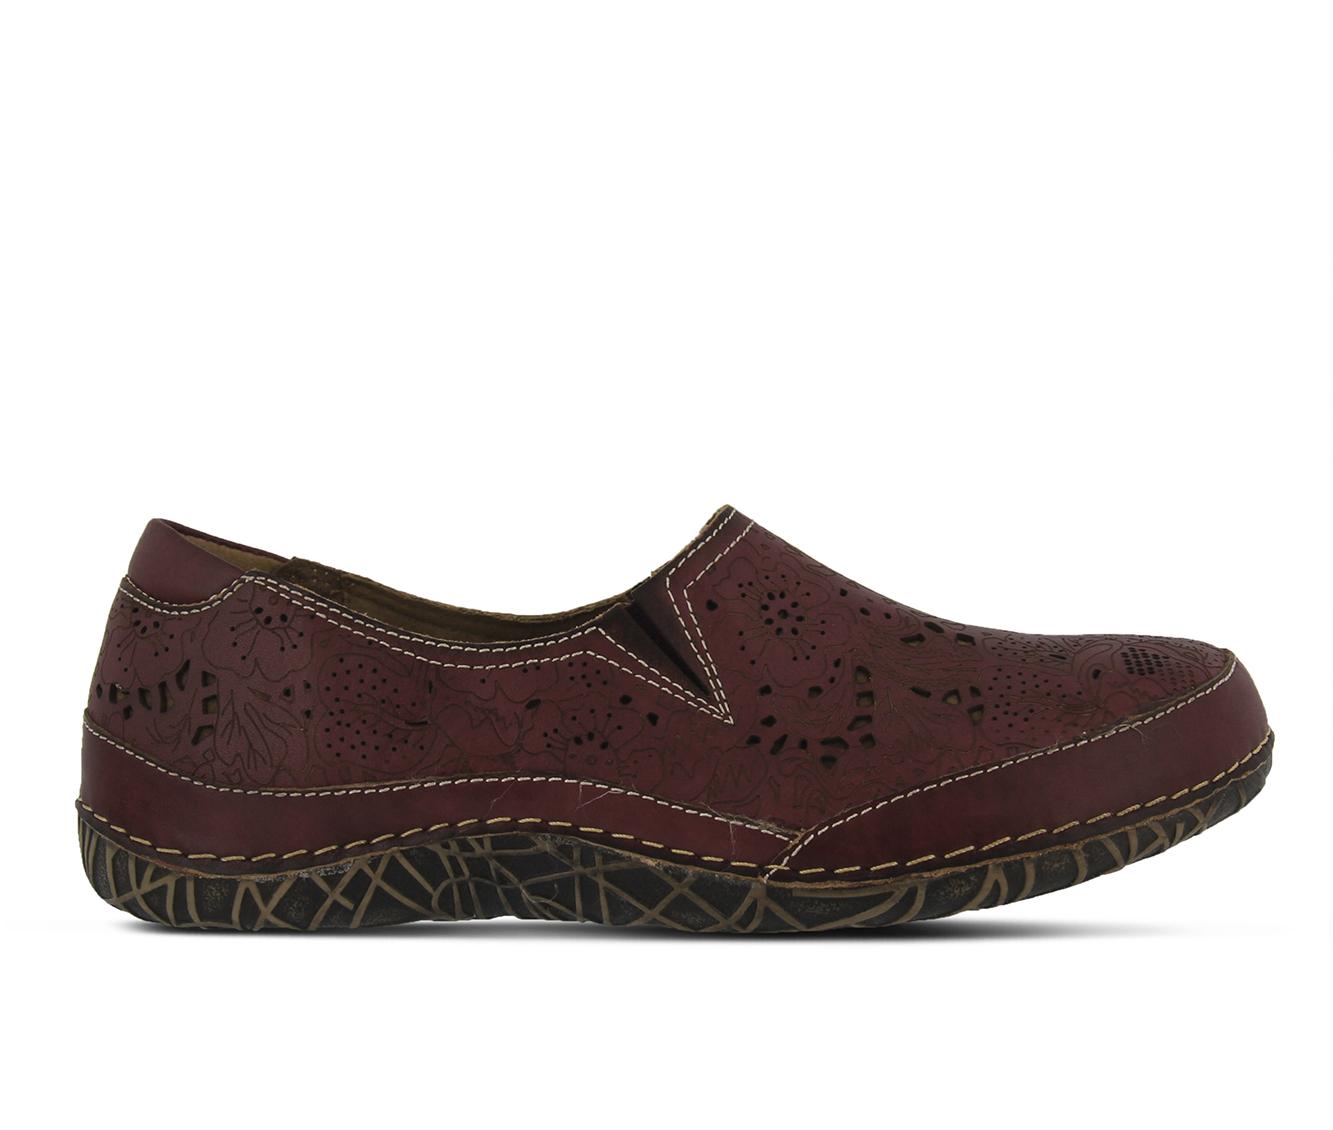 L'Artiste Libora Women's Shoe (Purple Leather)